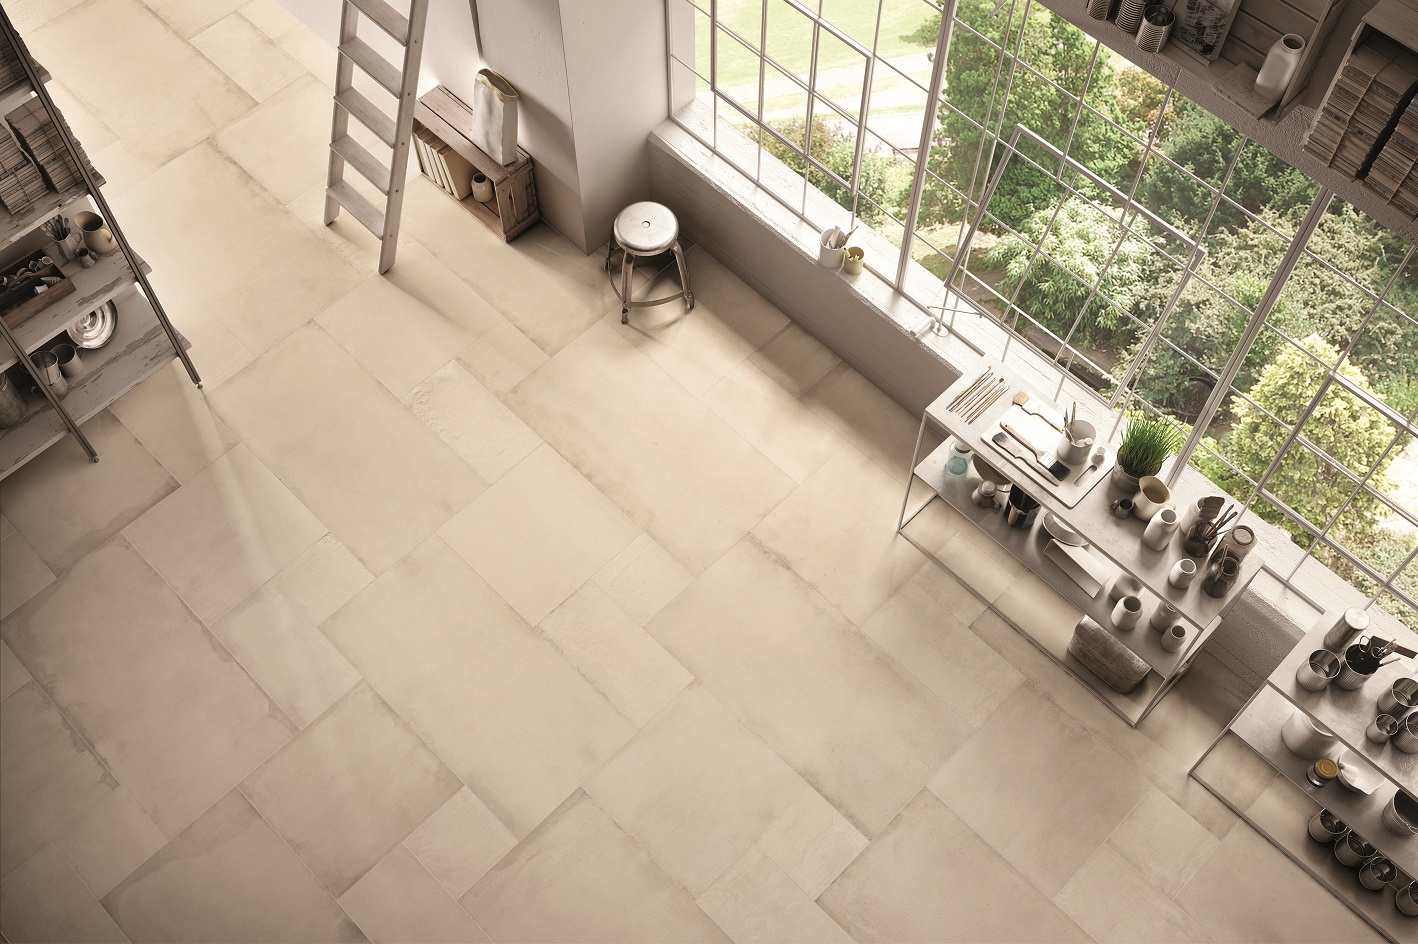 Acustico 12 White 60x120-60x60-30x60-30x30 Amb Semizen